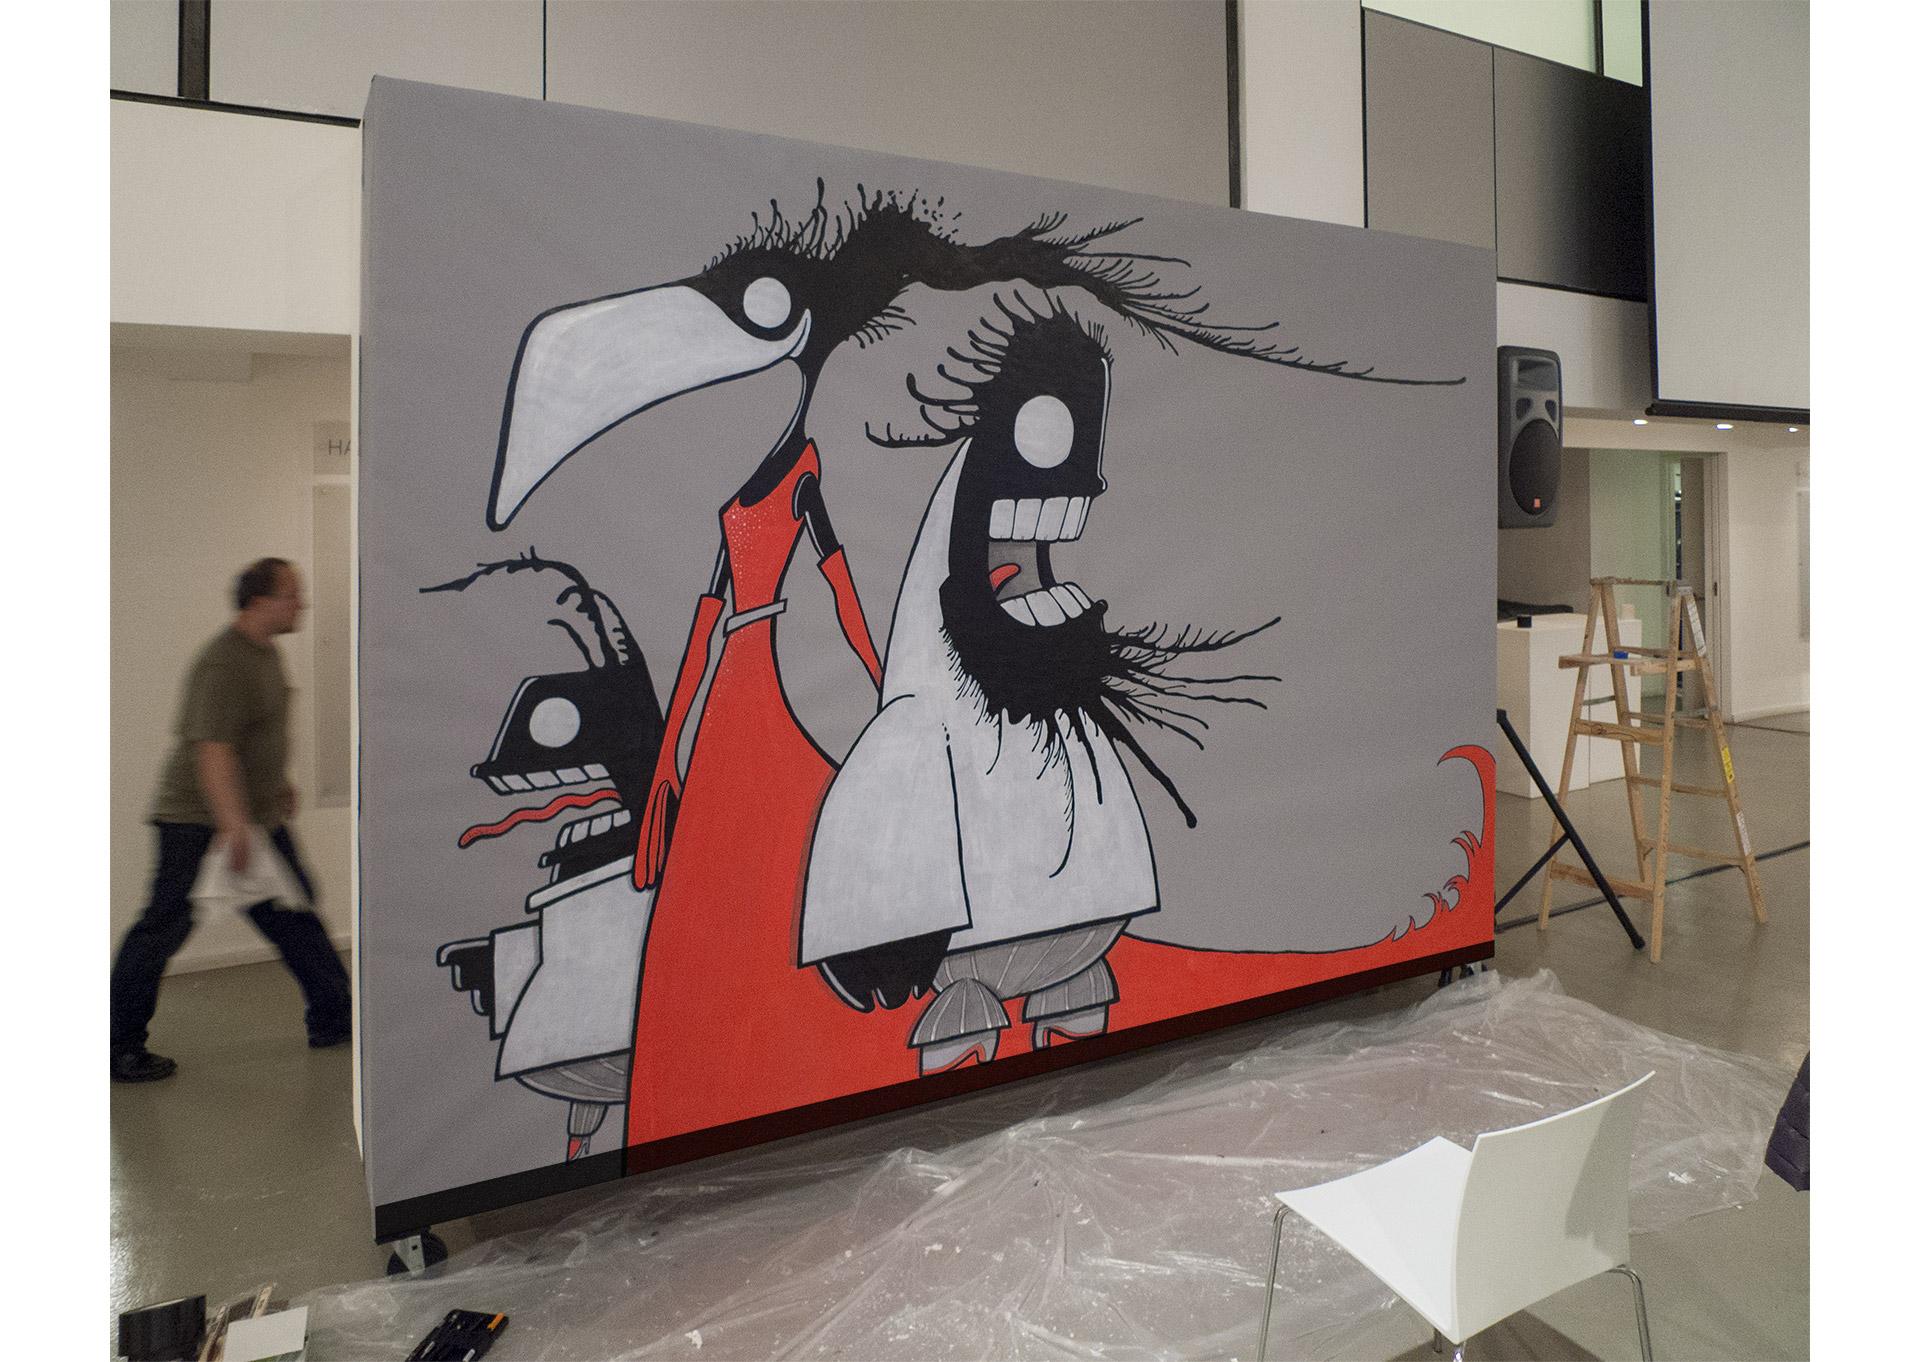 ADC-Mural-1@2x.jpg